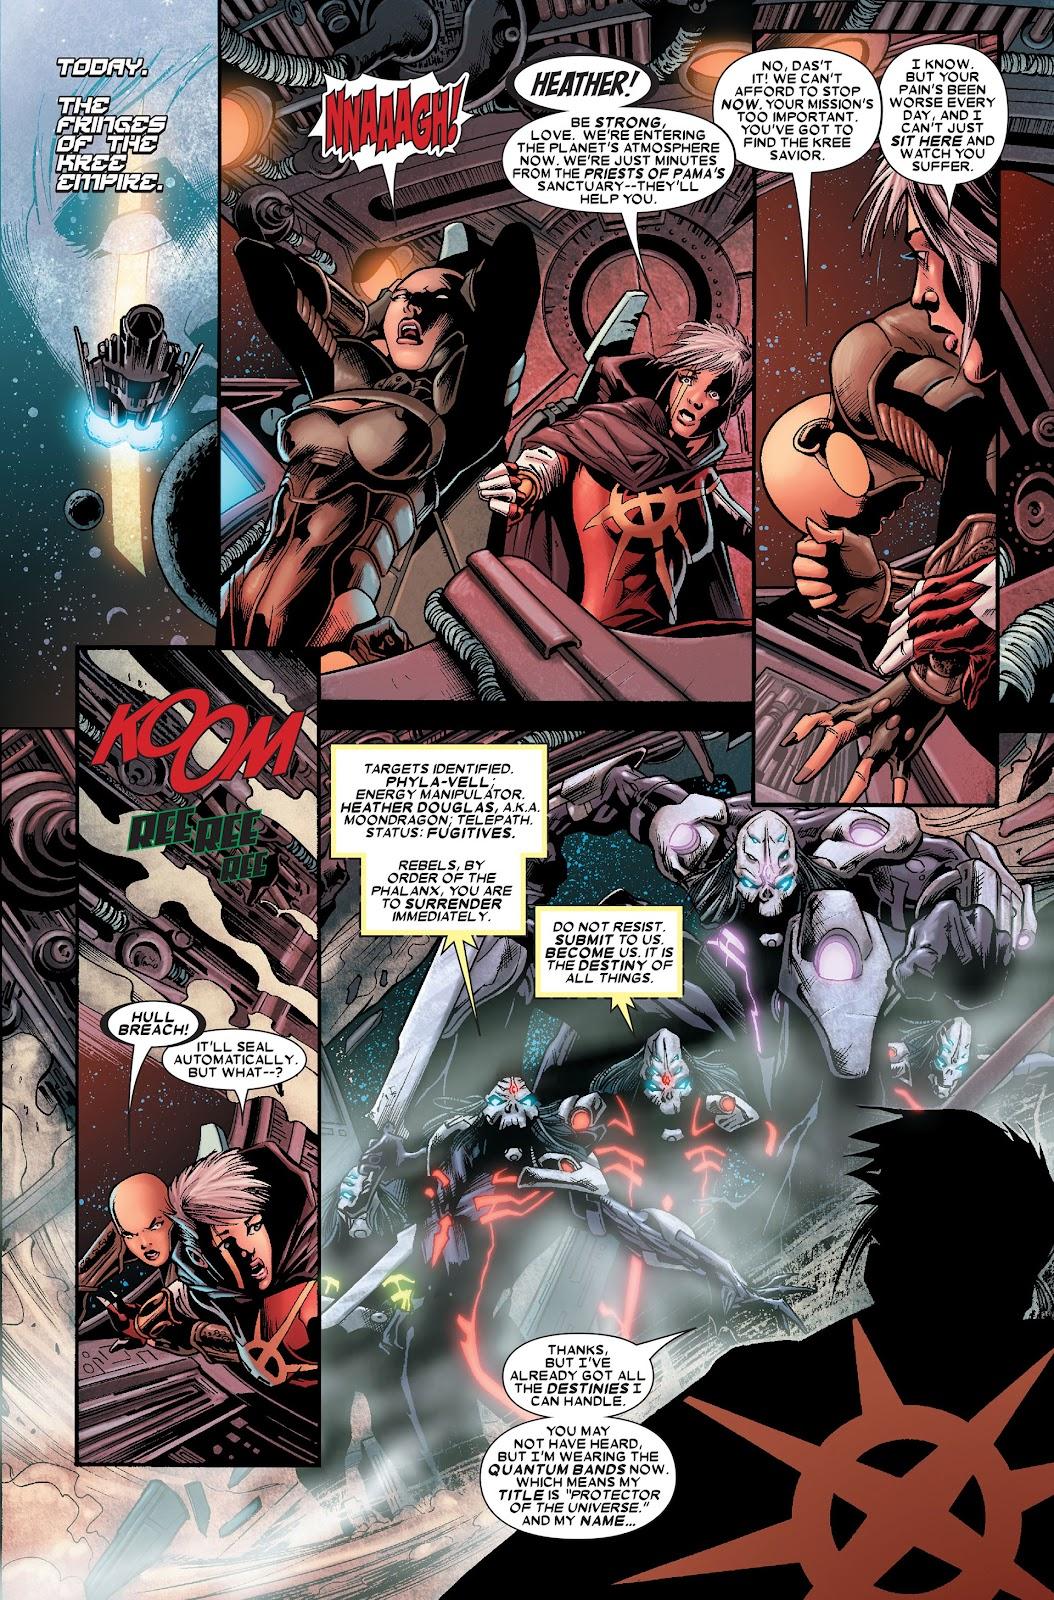 Annihilation: Conquest - Quasar issue 1 - Page 4